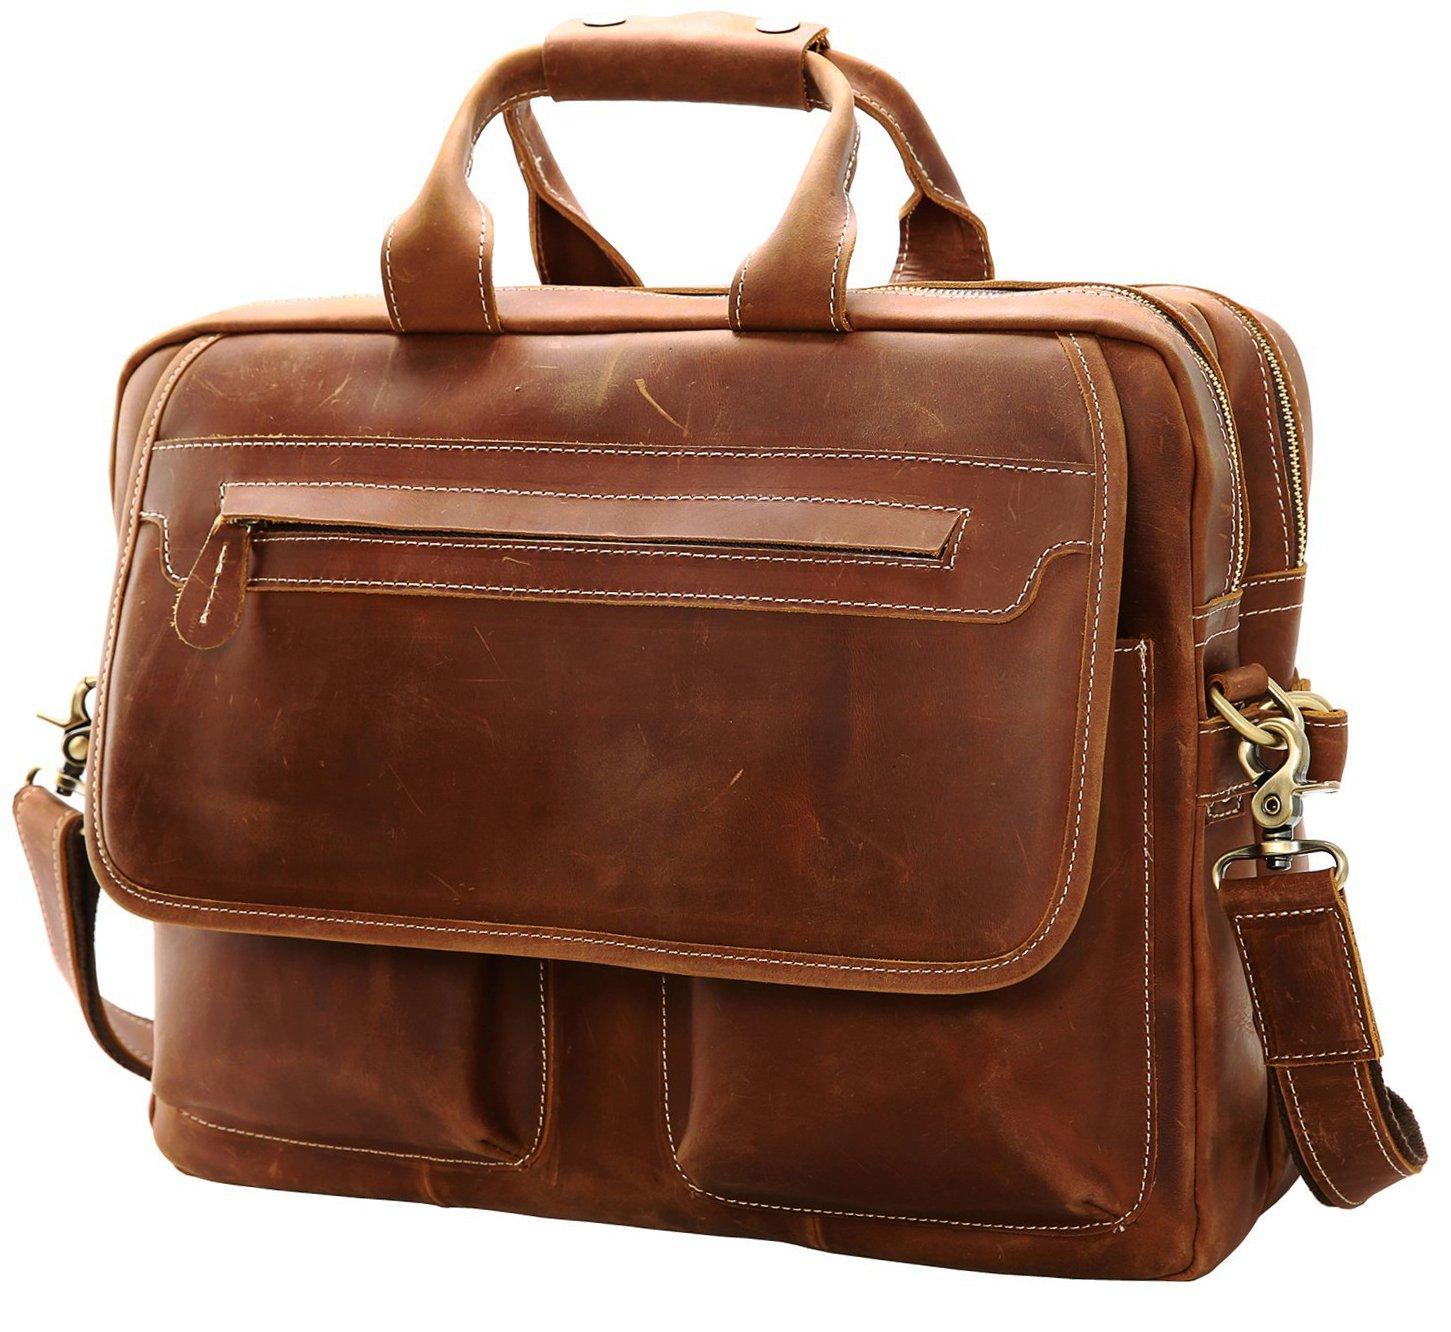 e913e1229525 hot sale 2017 Men s Messenger Bag Iswee Vintage Leather Portfolio Briefcase  14